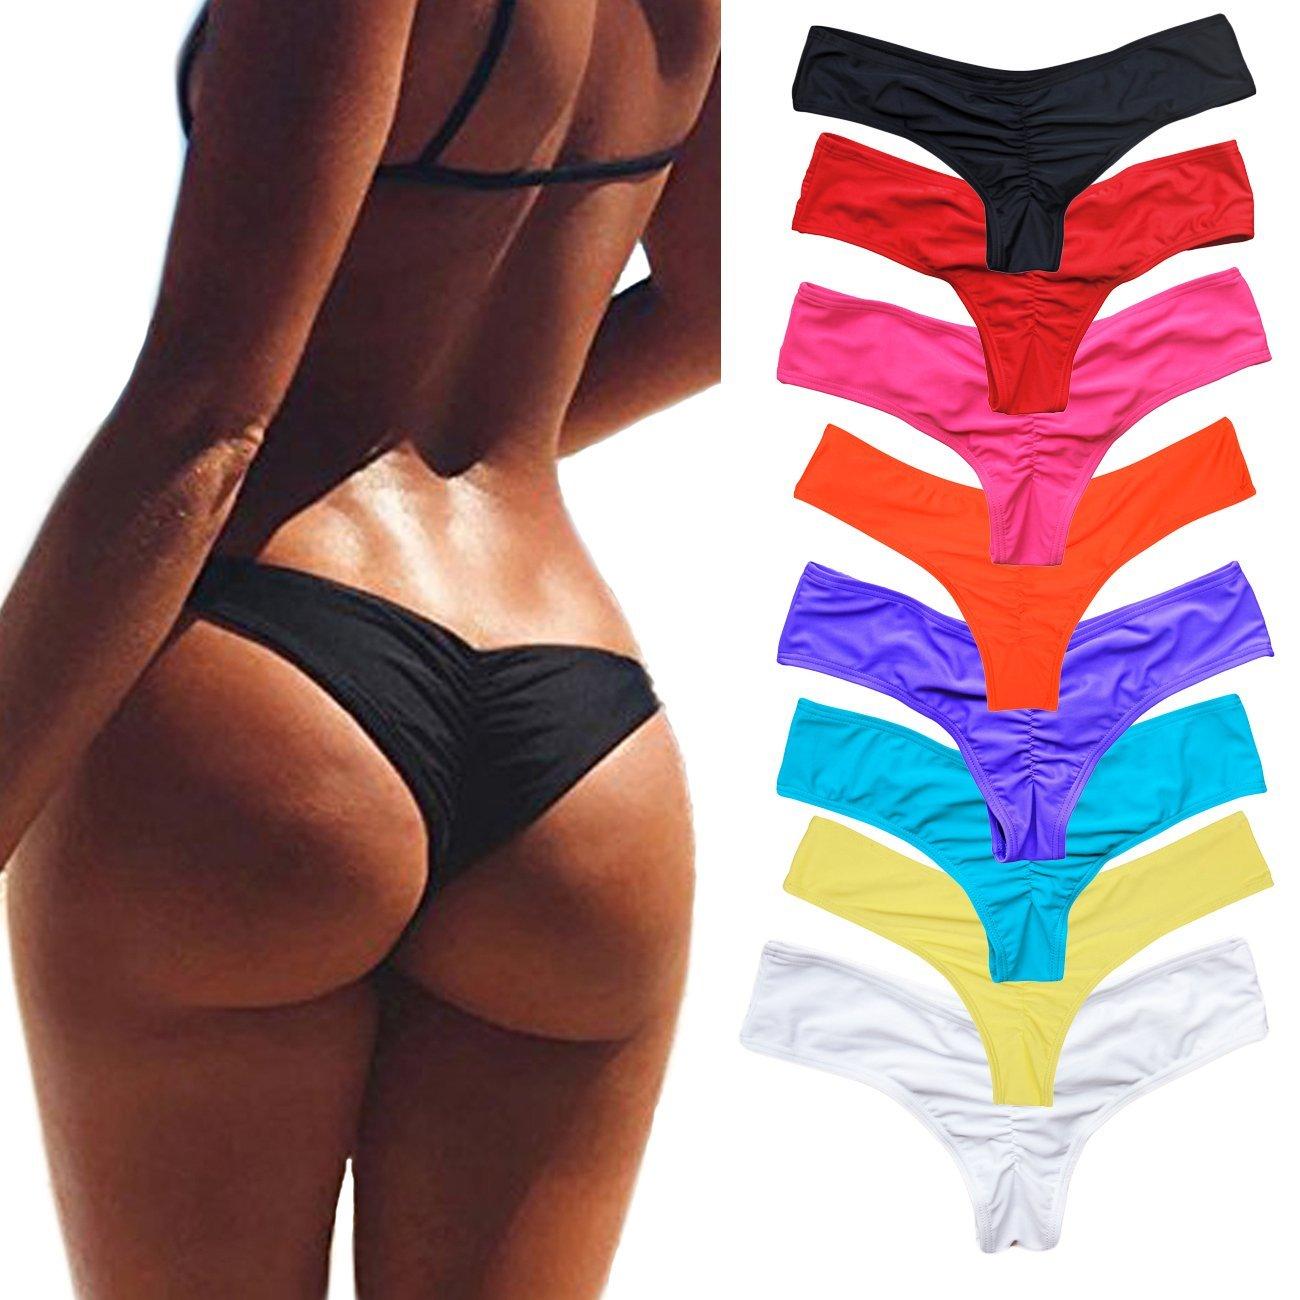 Women Ruffle Bikini Set Tube Top Tie Side Thong G-string Swimsuit Bathing Suit